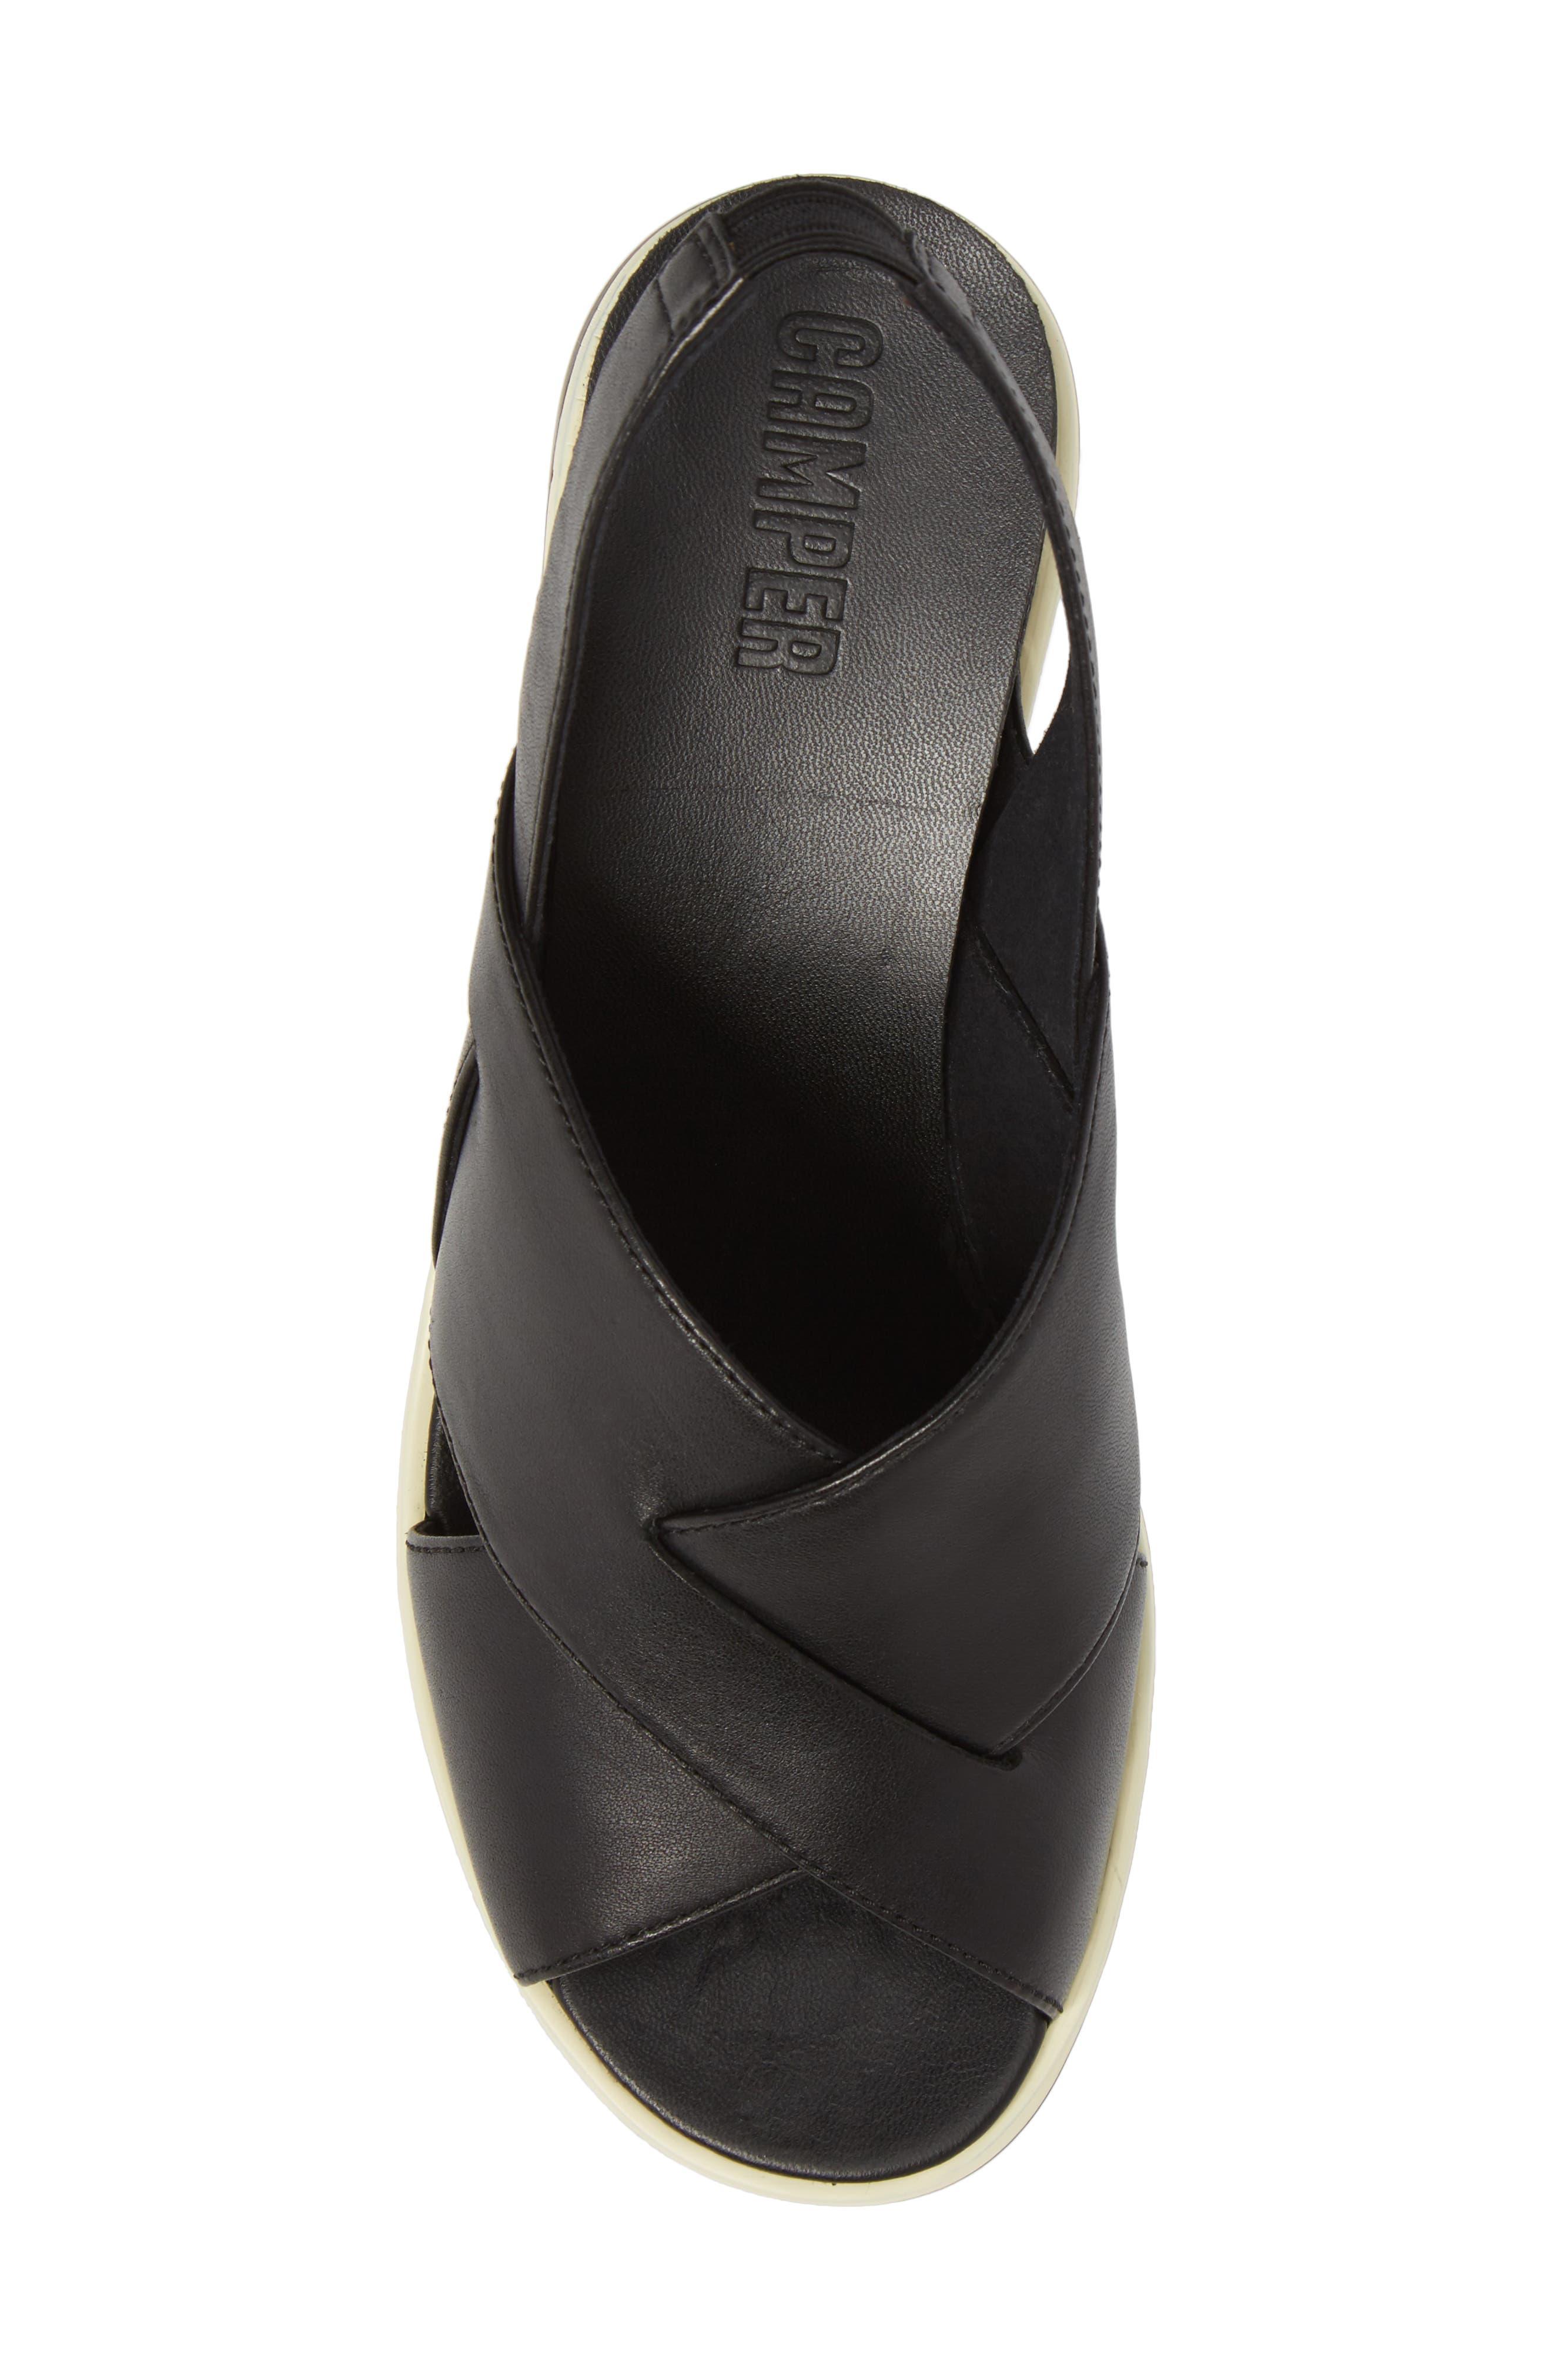 Tropik Cross Strap Wedge Sandal,                             Alternate thumbnail 5, color,                             BLACK LEATHER